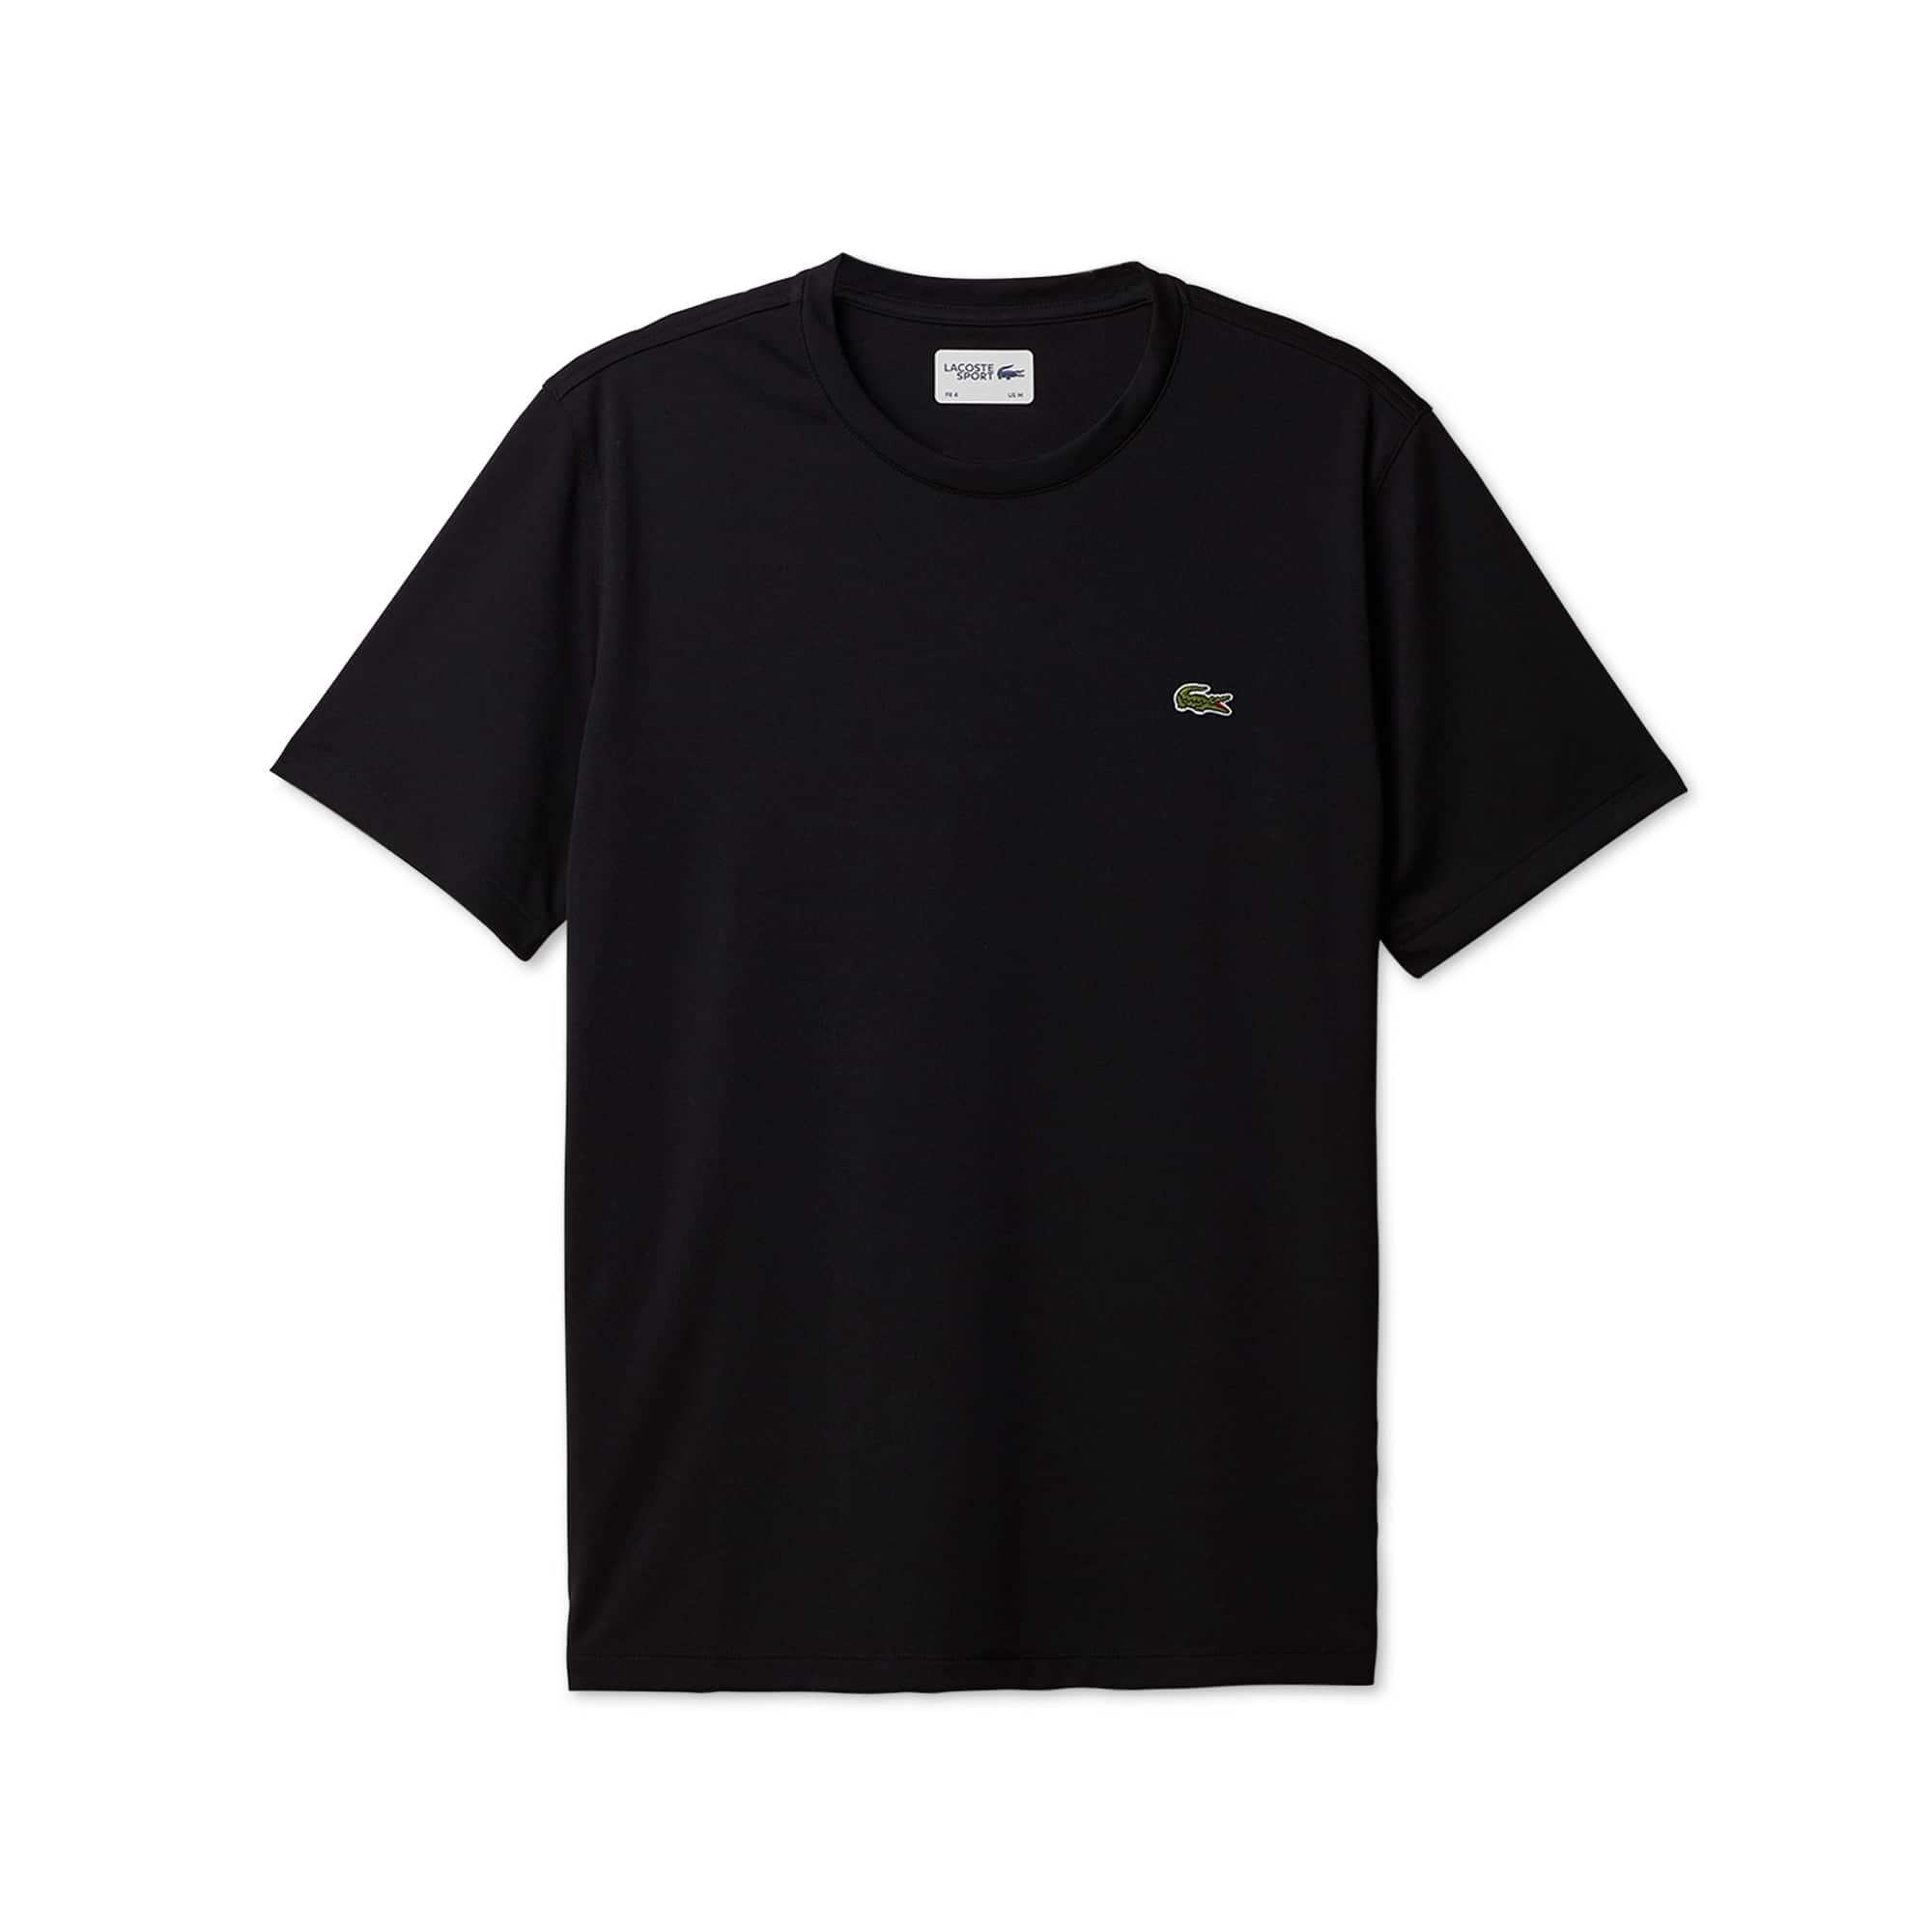 f0af21f5923 + 2 cores · Camiseta Lacoste masculina técnica